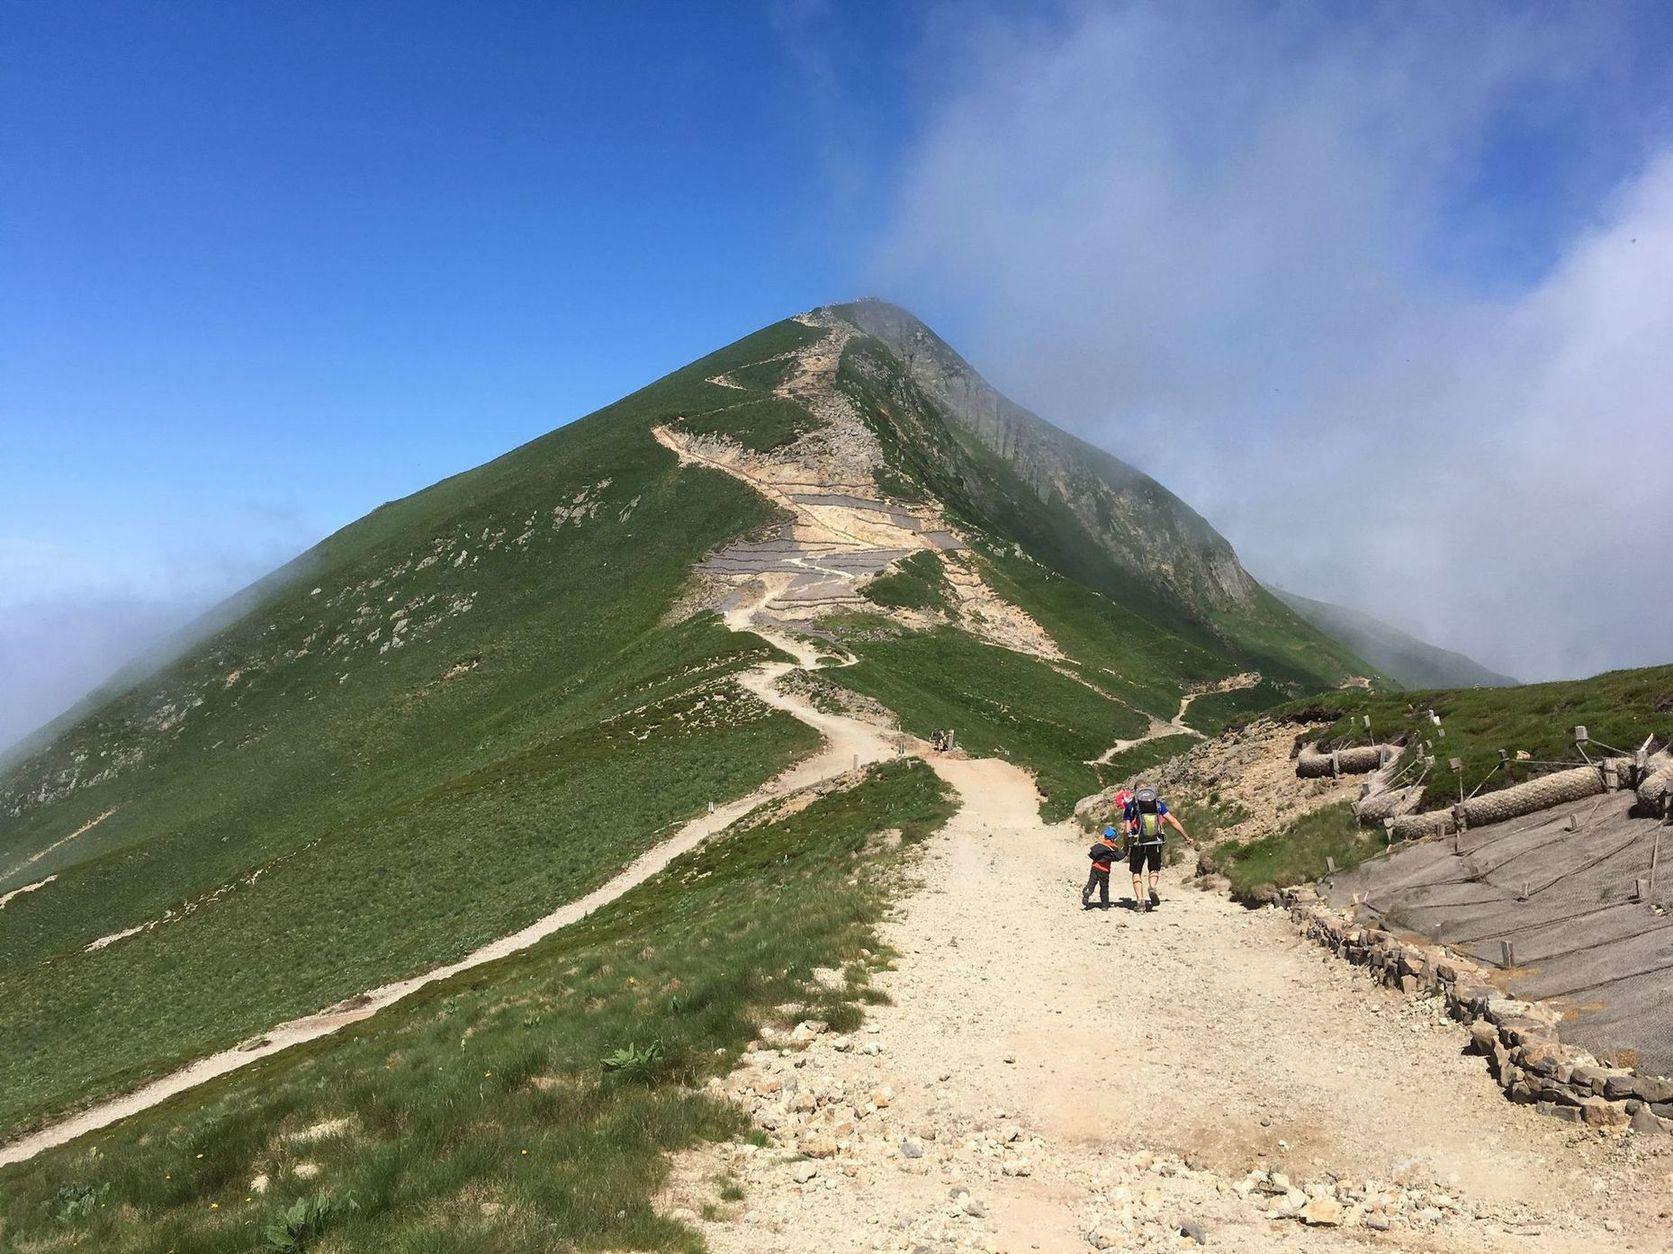 Sentiers-crete-super-besse